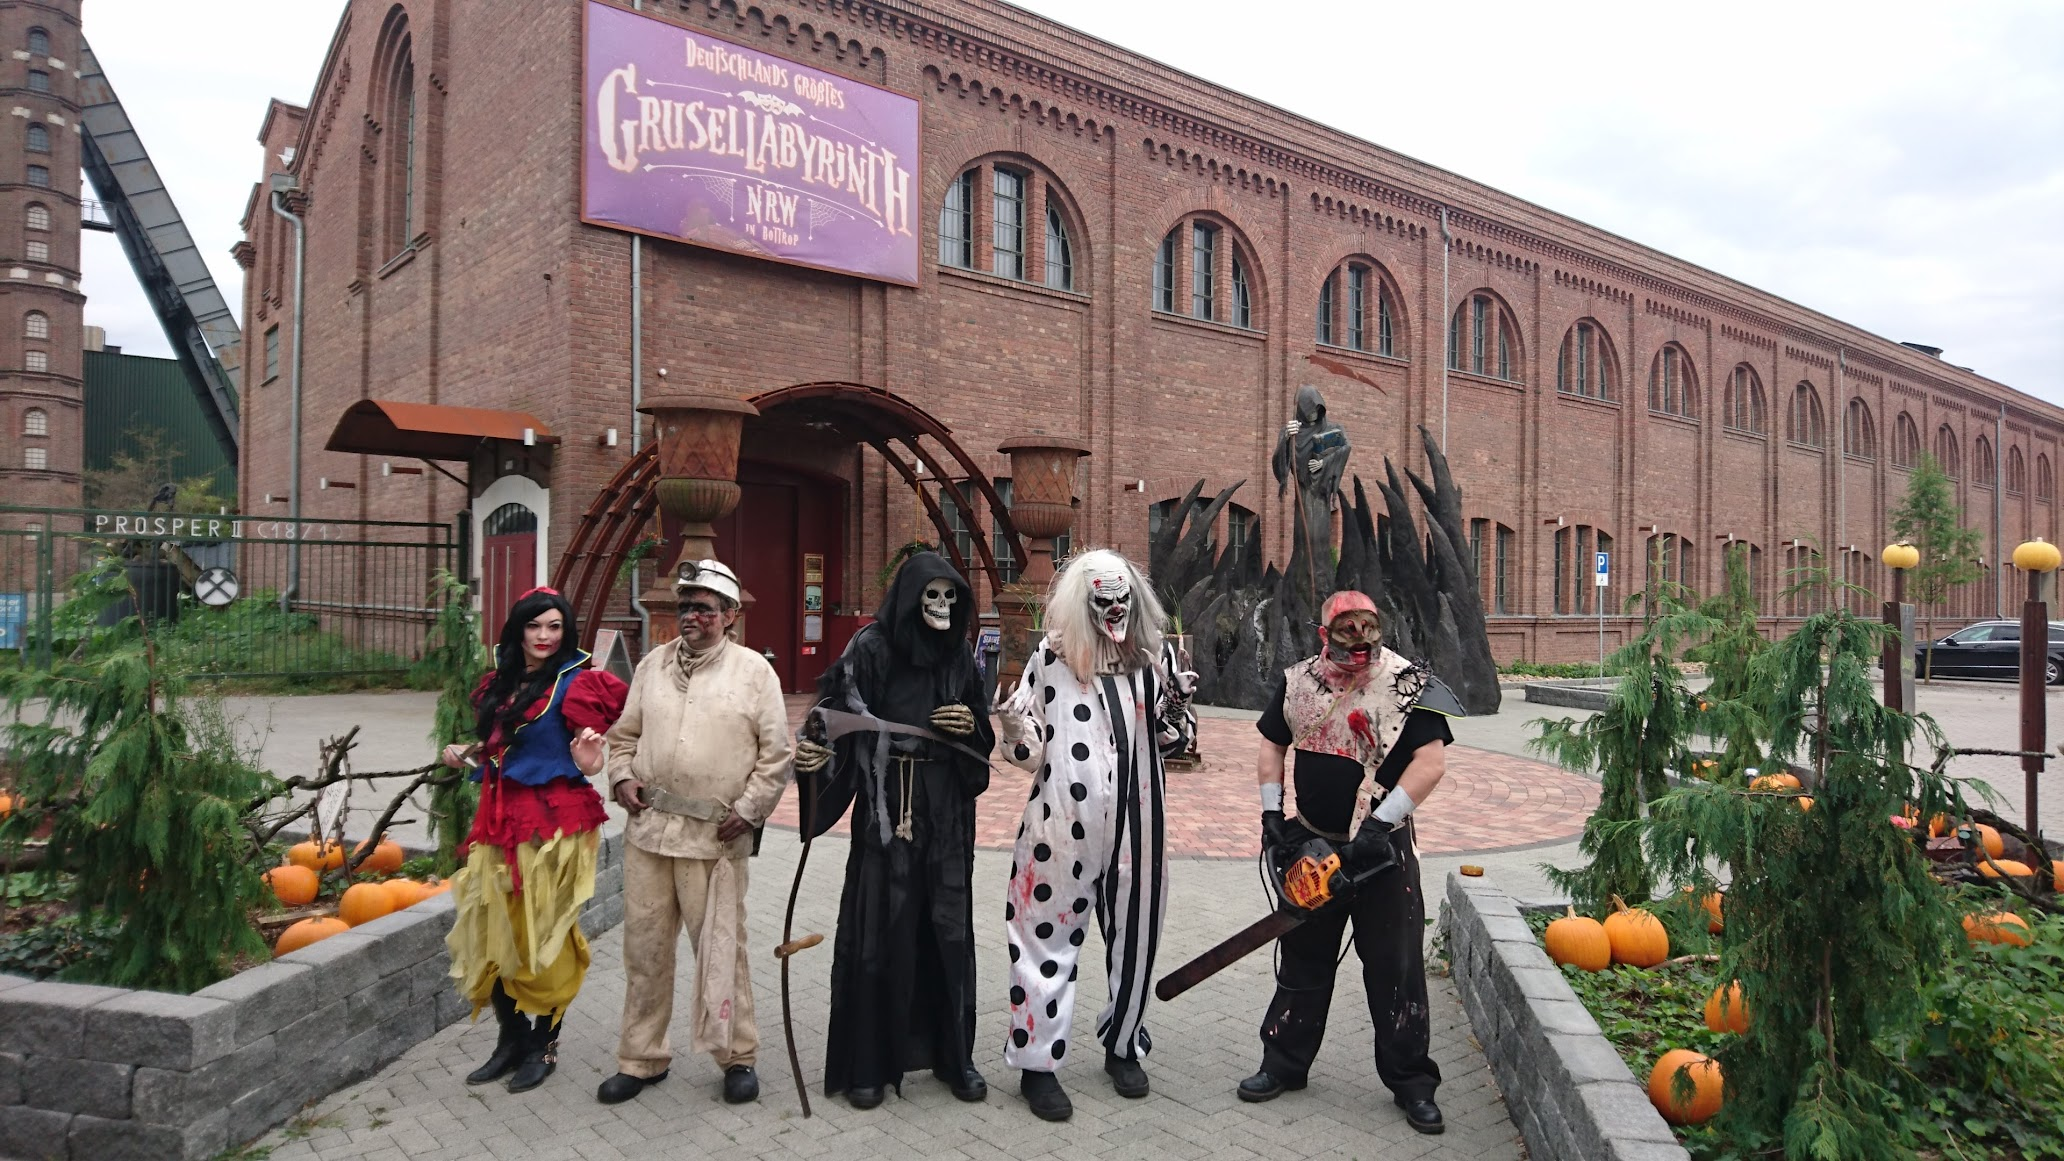 Grusellabyrinth NRW Bottrop Horror Halloween